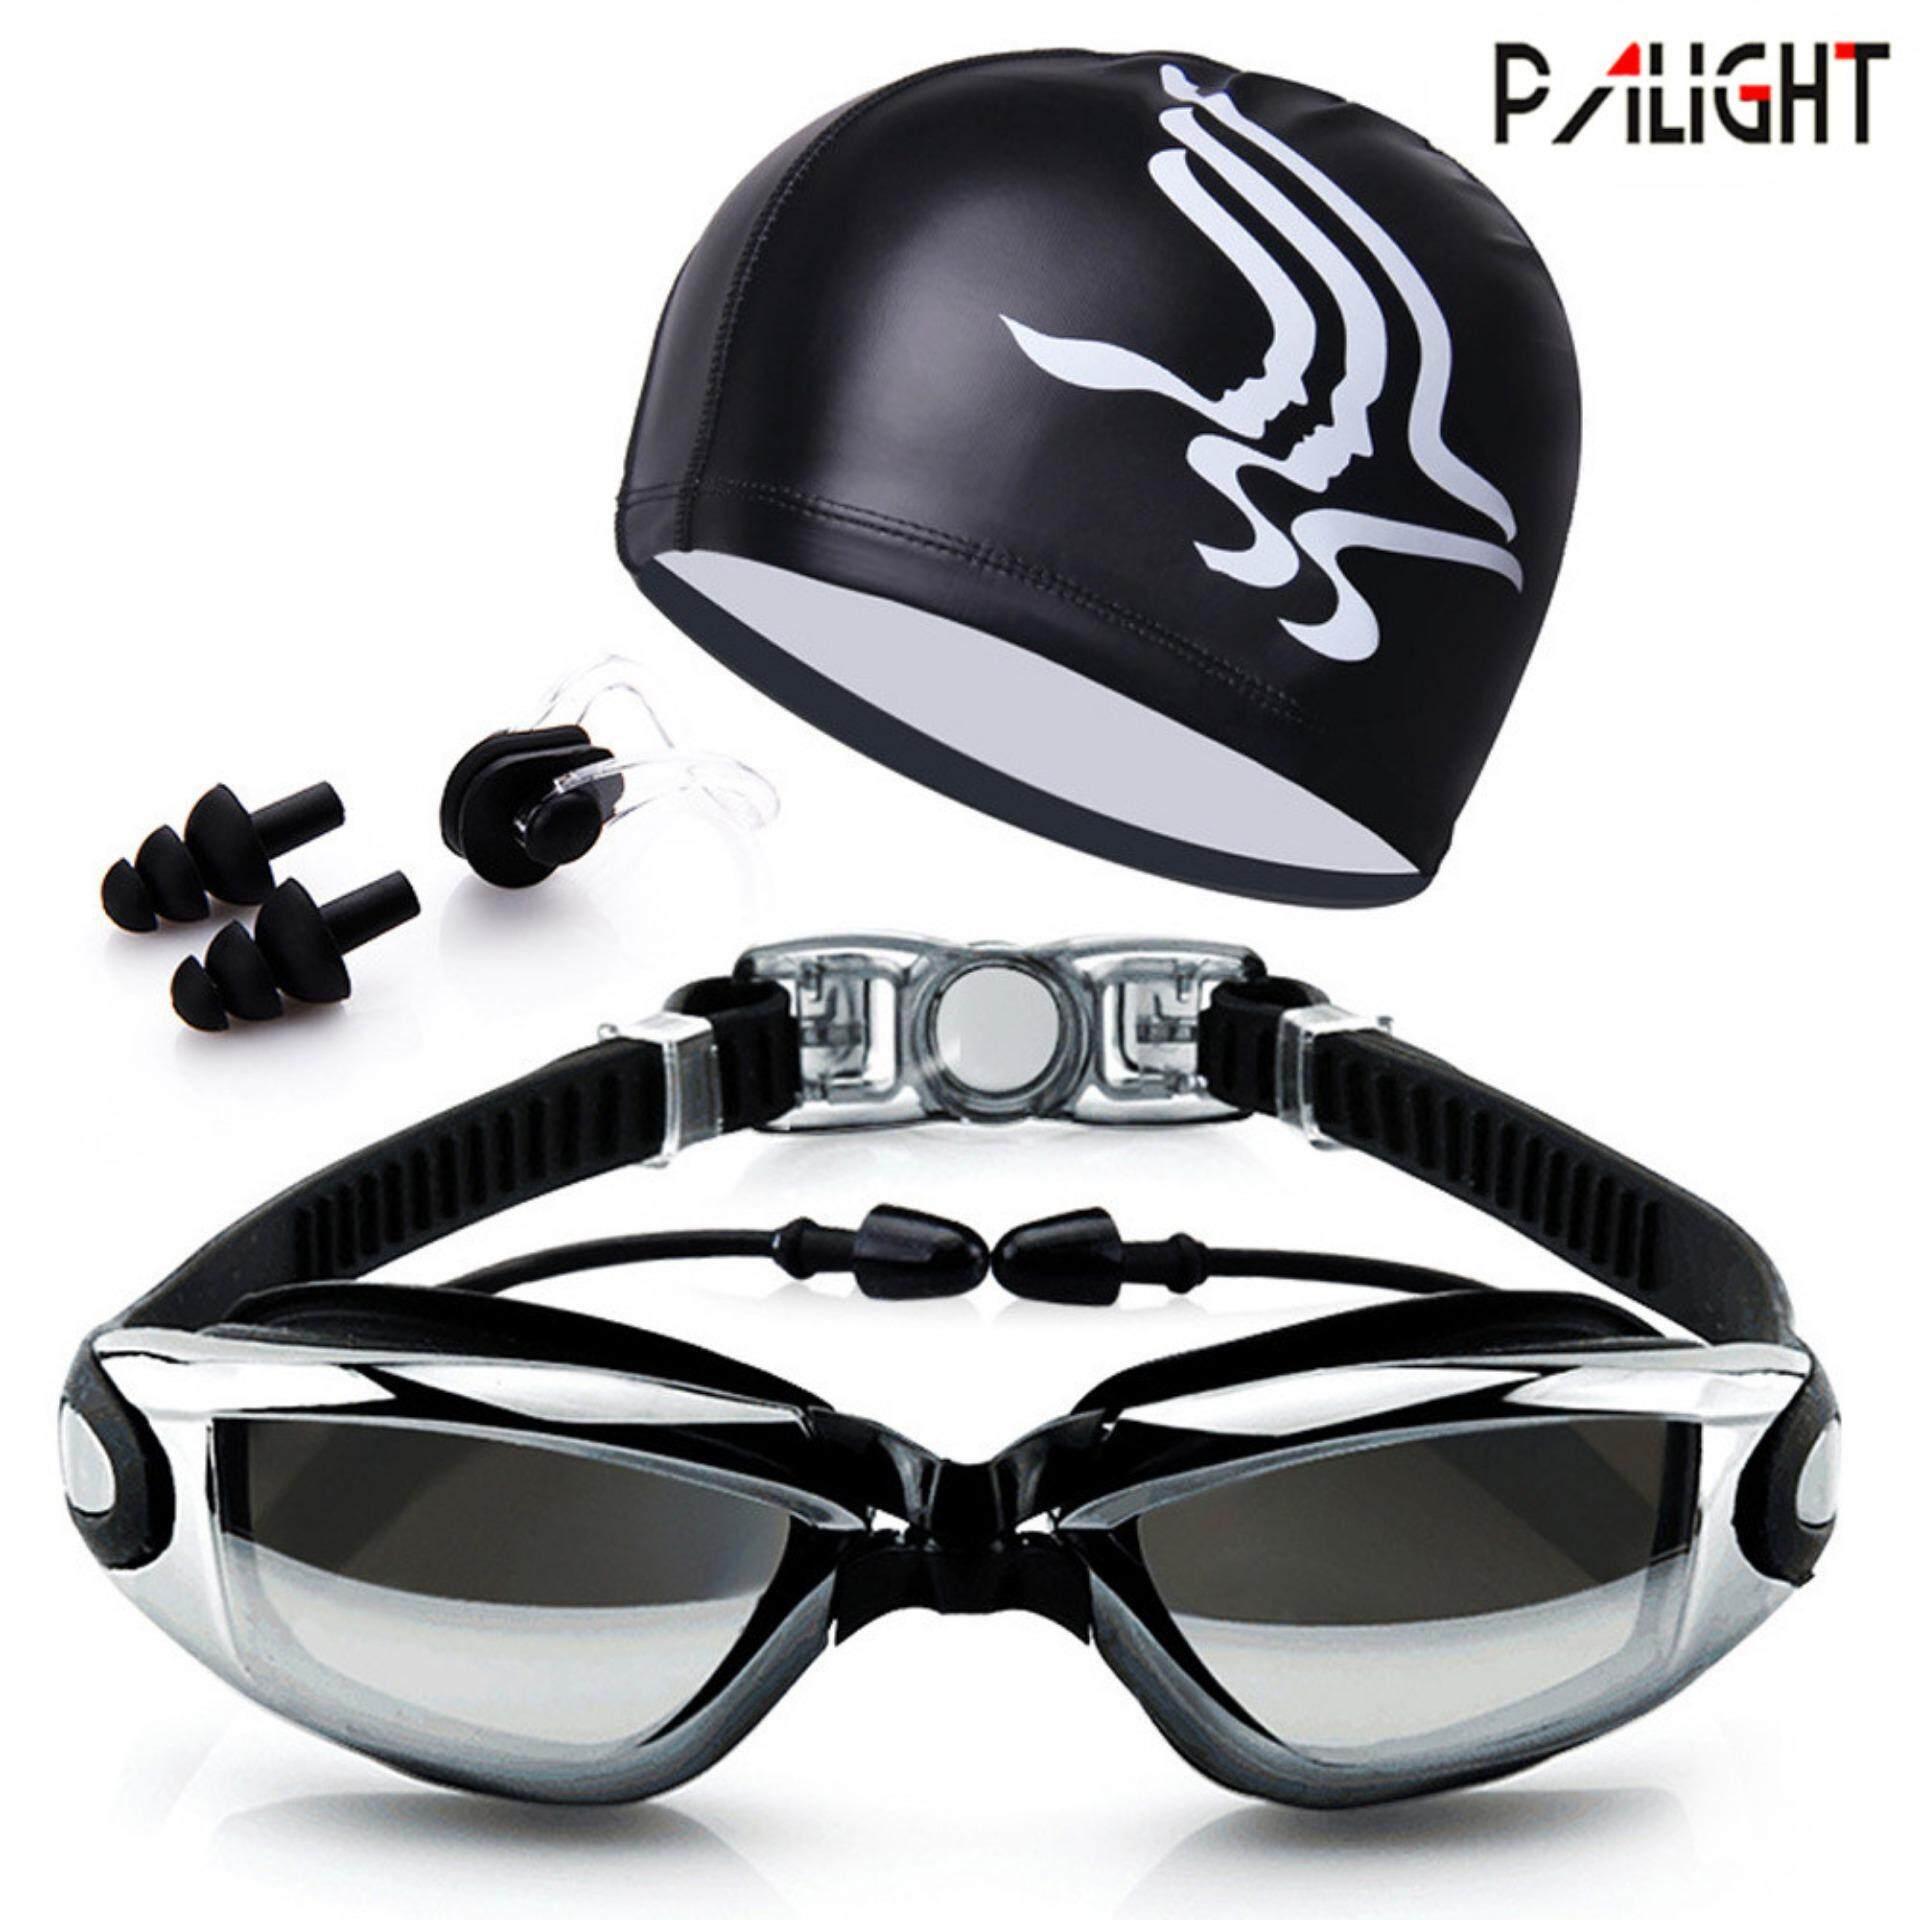 Palight แว่นตาว่ายน้ำผู้ใหญ่ชุดเคลือบเลนส์ป้องกันหมอกแว่นตาว่ายน้ำ + หมวก + + คลิปหนีบจมูก + ปลั๊กอุดหู - Intl